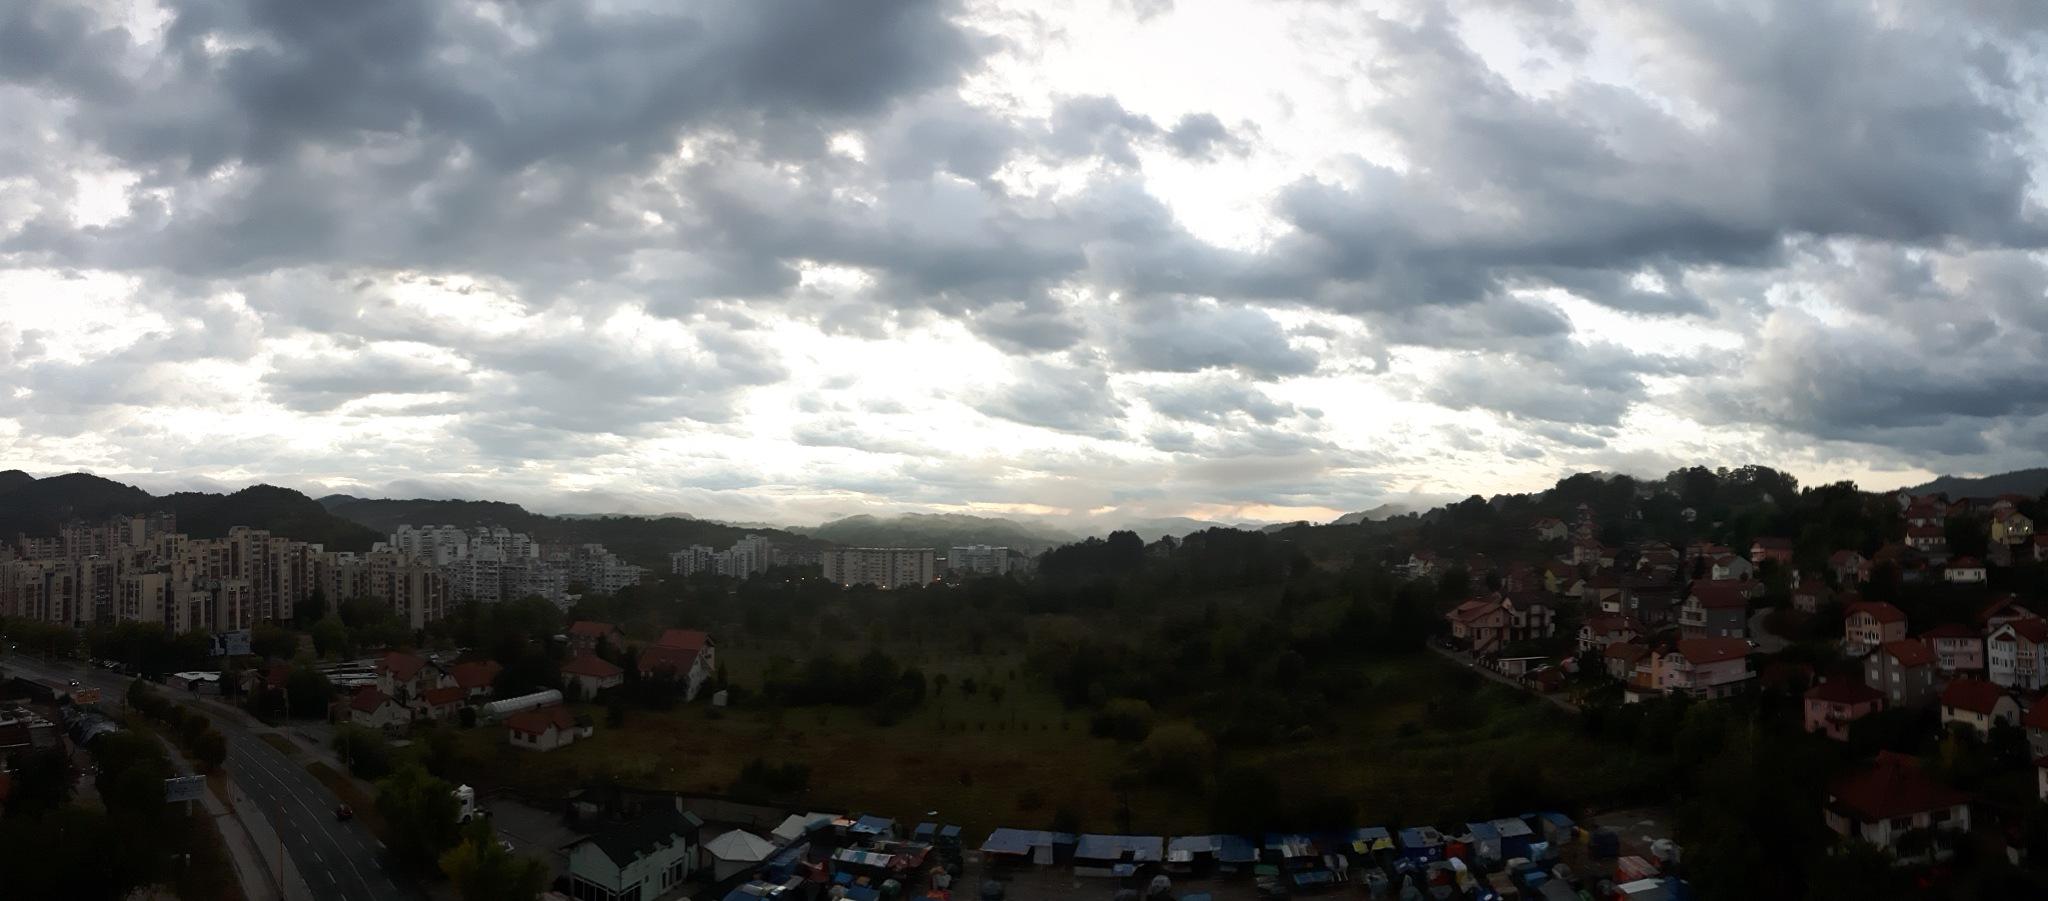 Day light prevails by Mevludin_Hasanovic